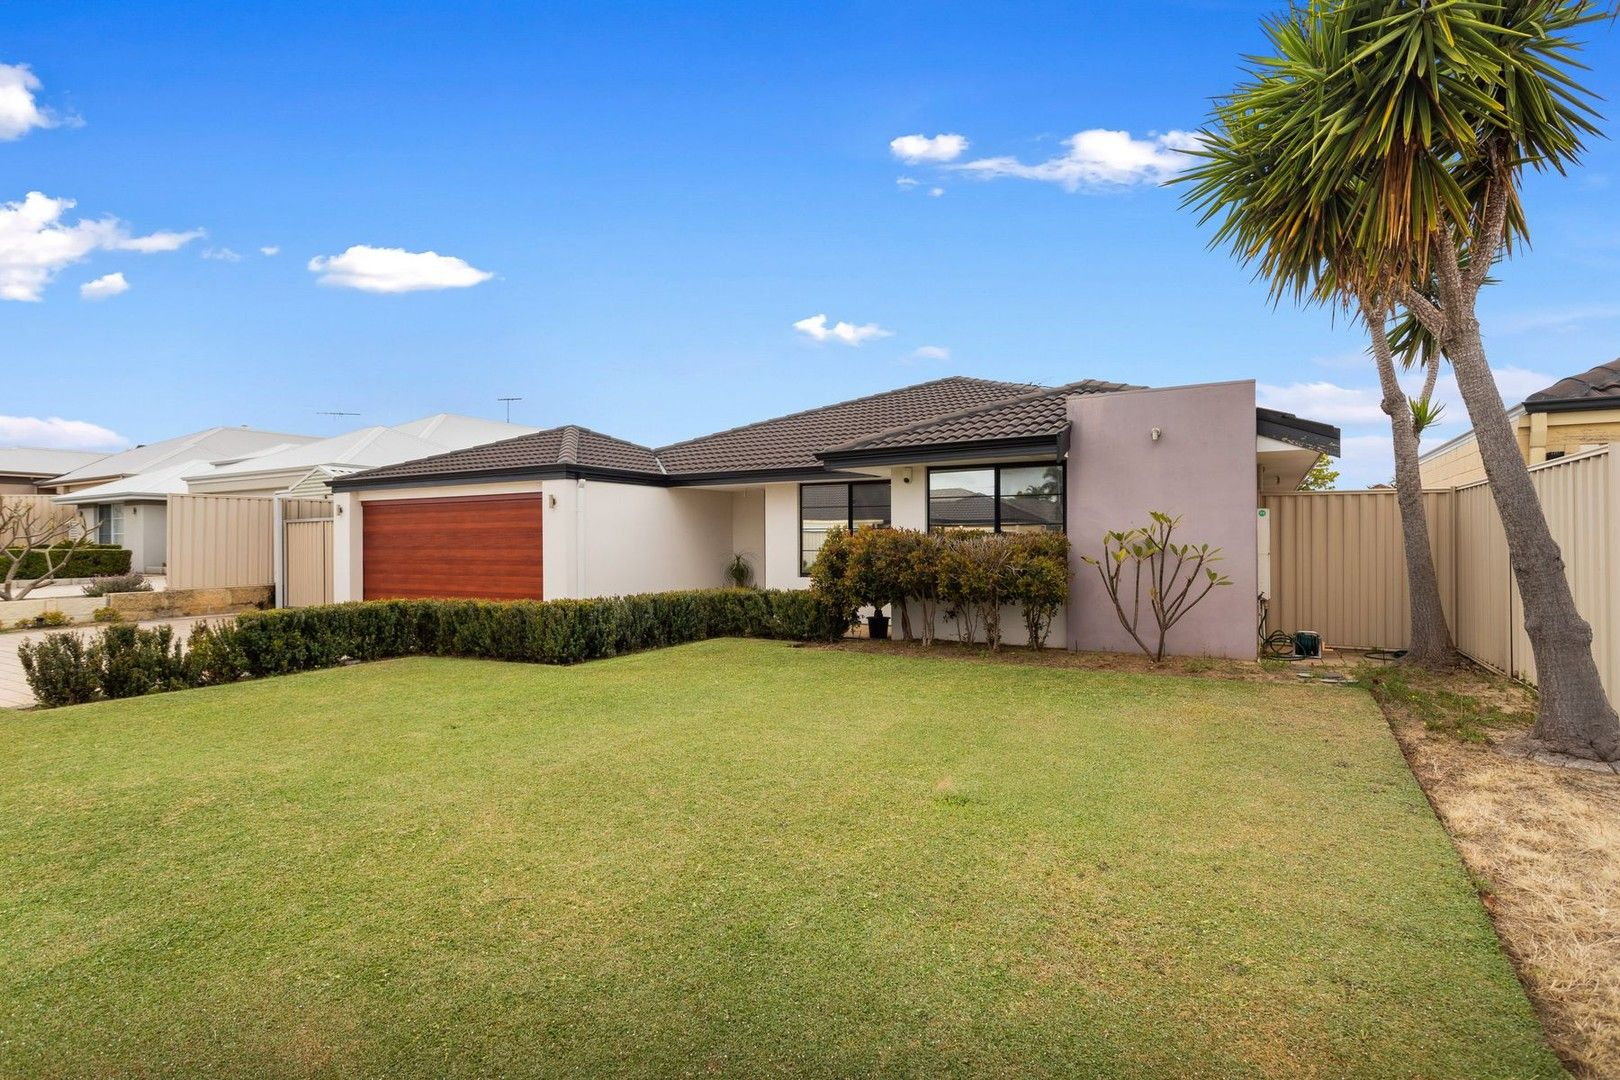 3 bedrooms House in 2 Hookstone Drive LANDSDALE WA, 6065